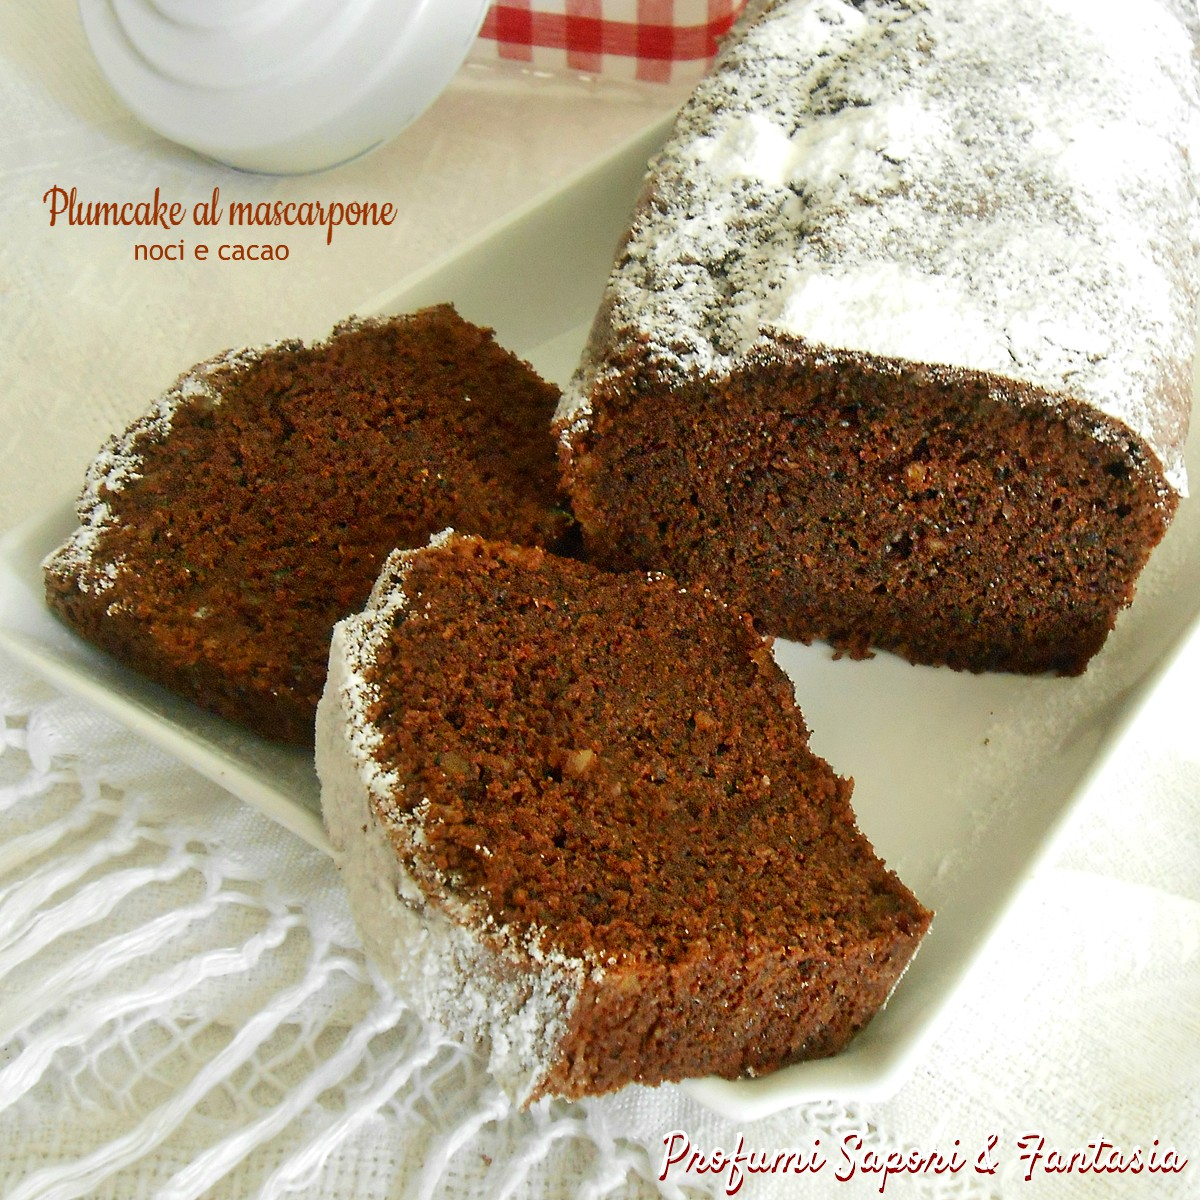 Plumcake al mascarpone noci e cacao